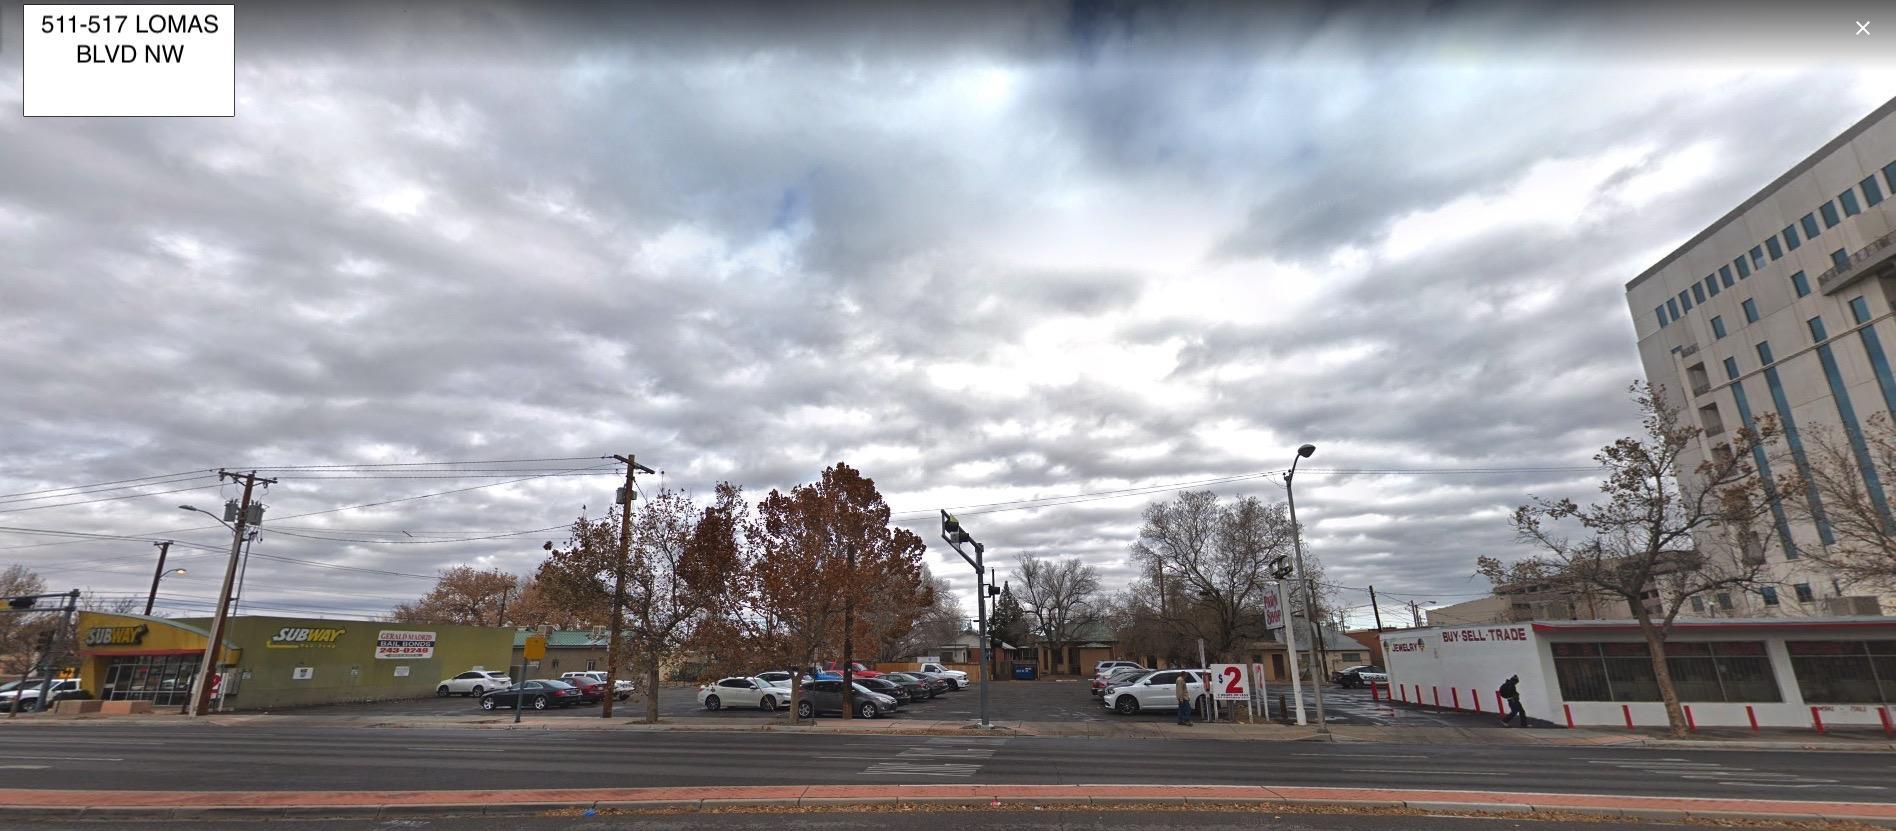 513 Lomas Boulevard NW Property Photo - Albuquerque, NM real estate listing